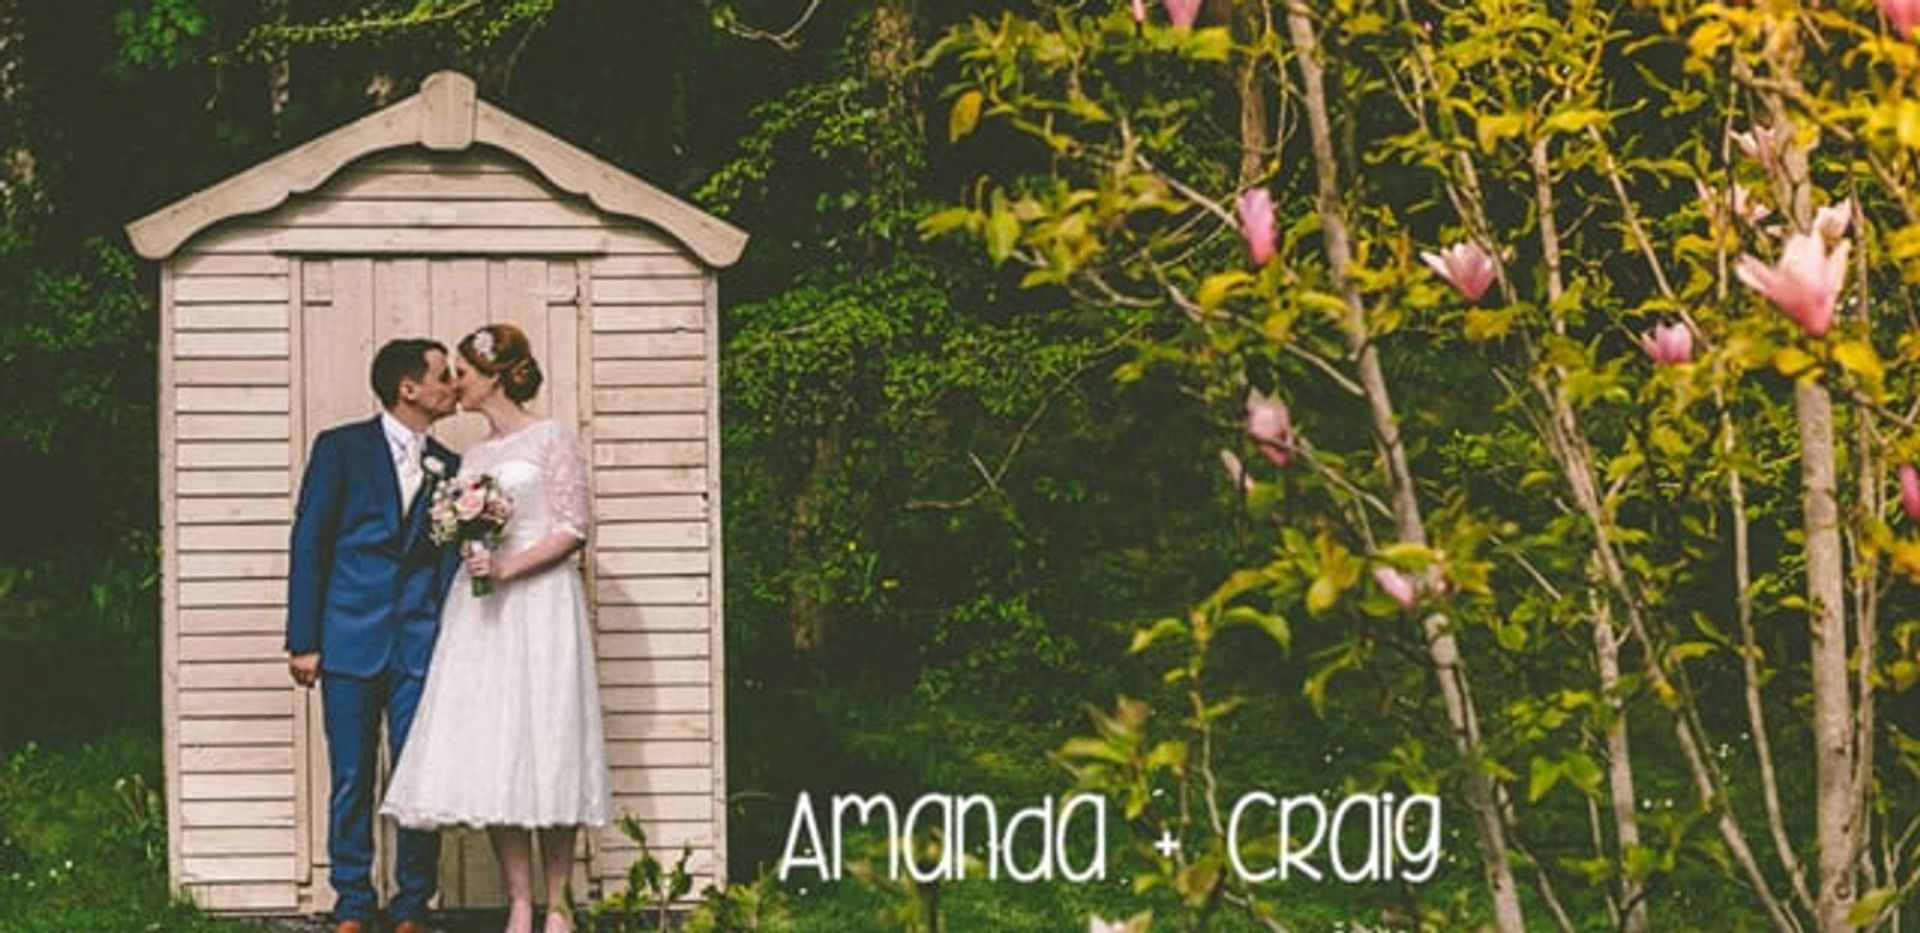 Amanda & Craig